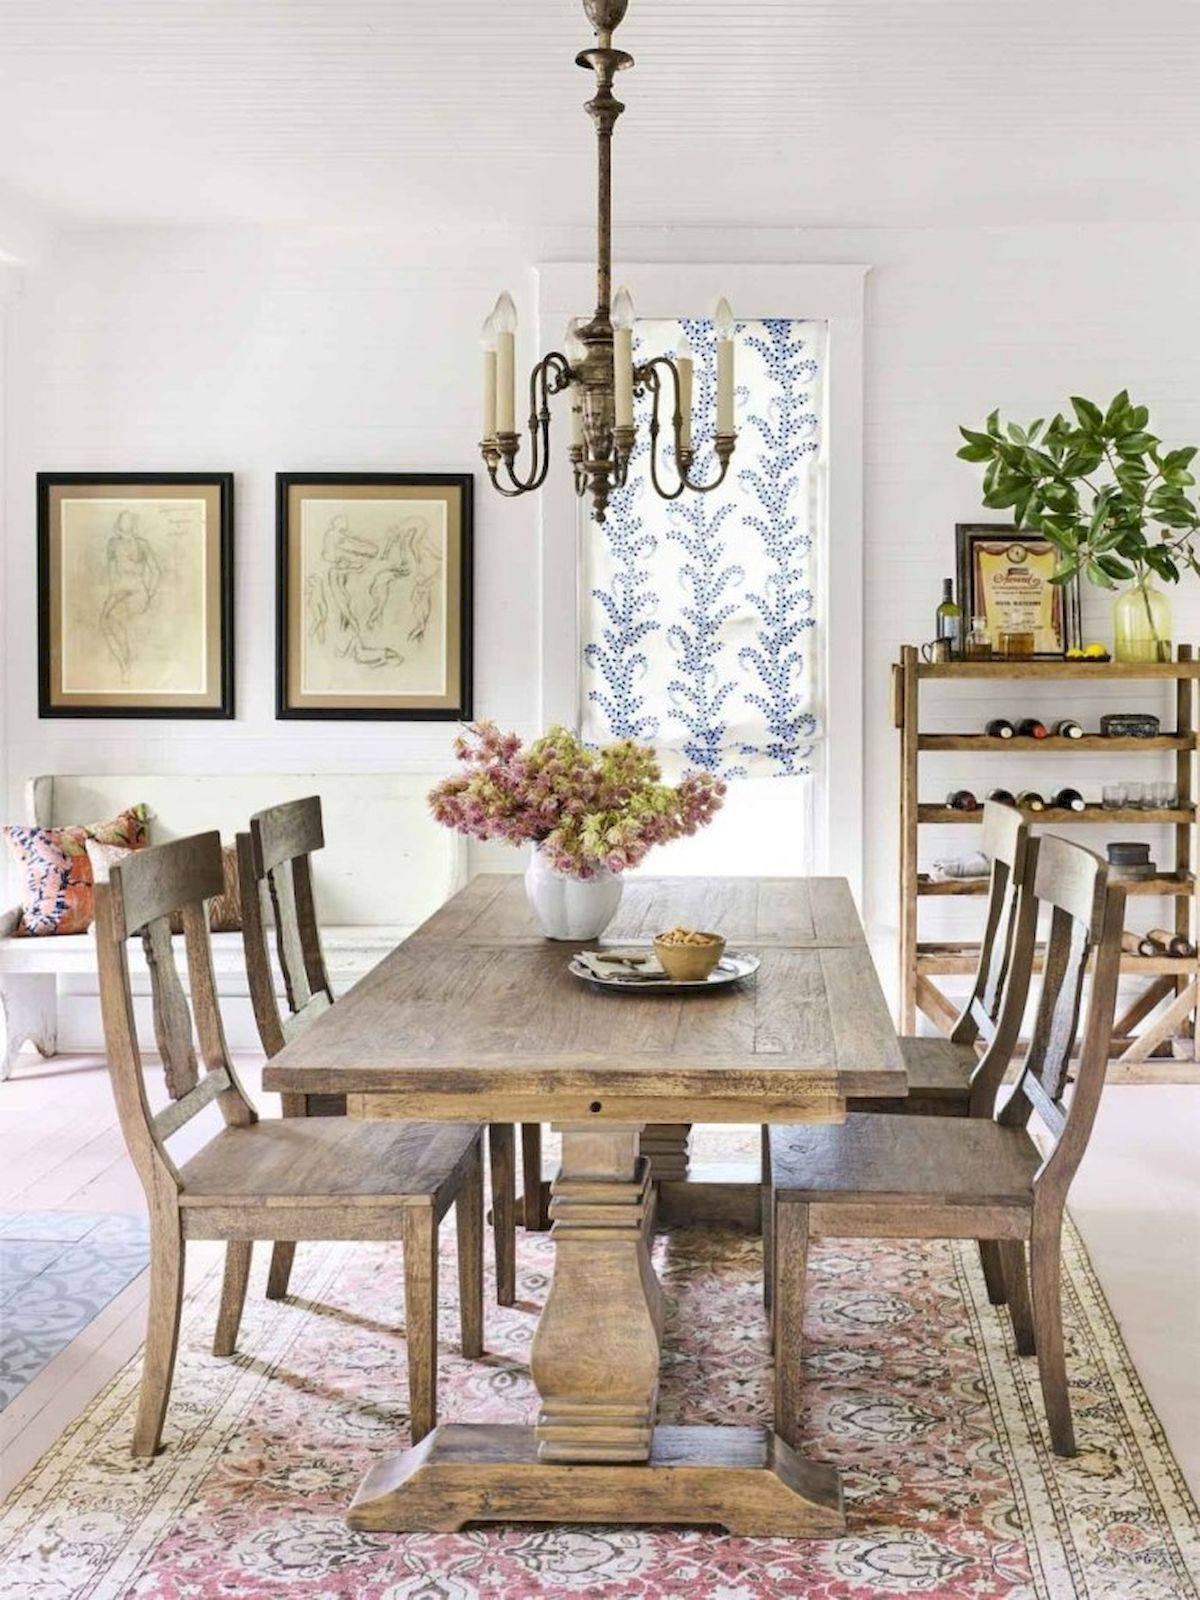 40 Adorable Farmhouse Dining Room Design And Decor Ideas (39)